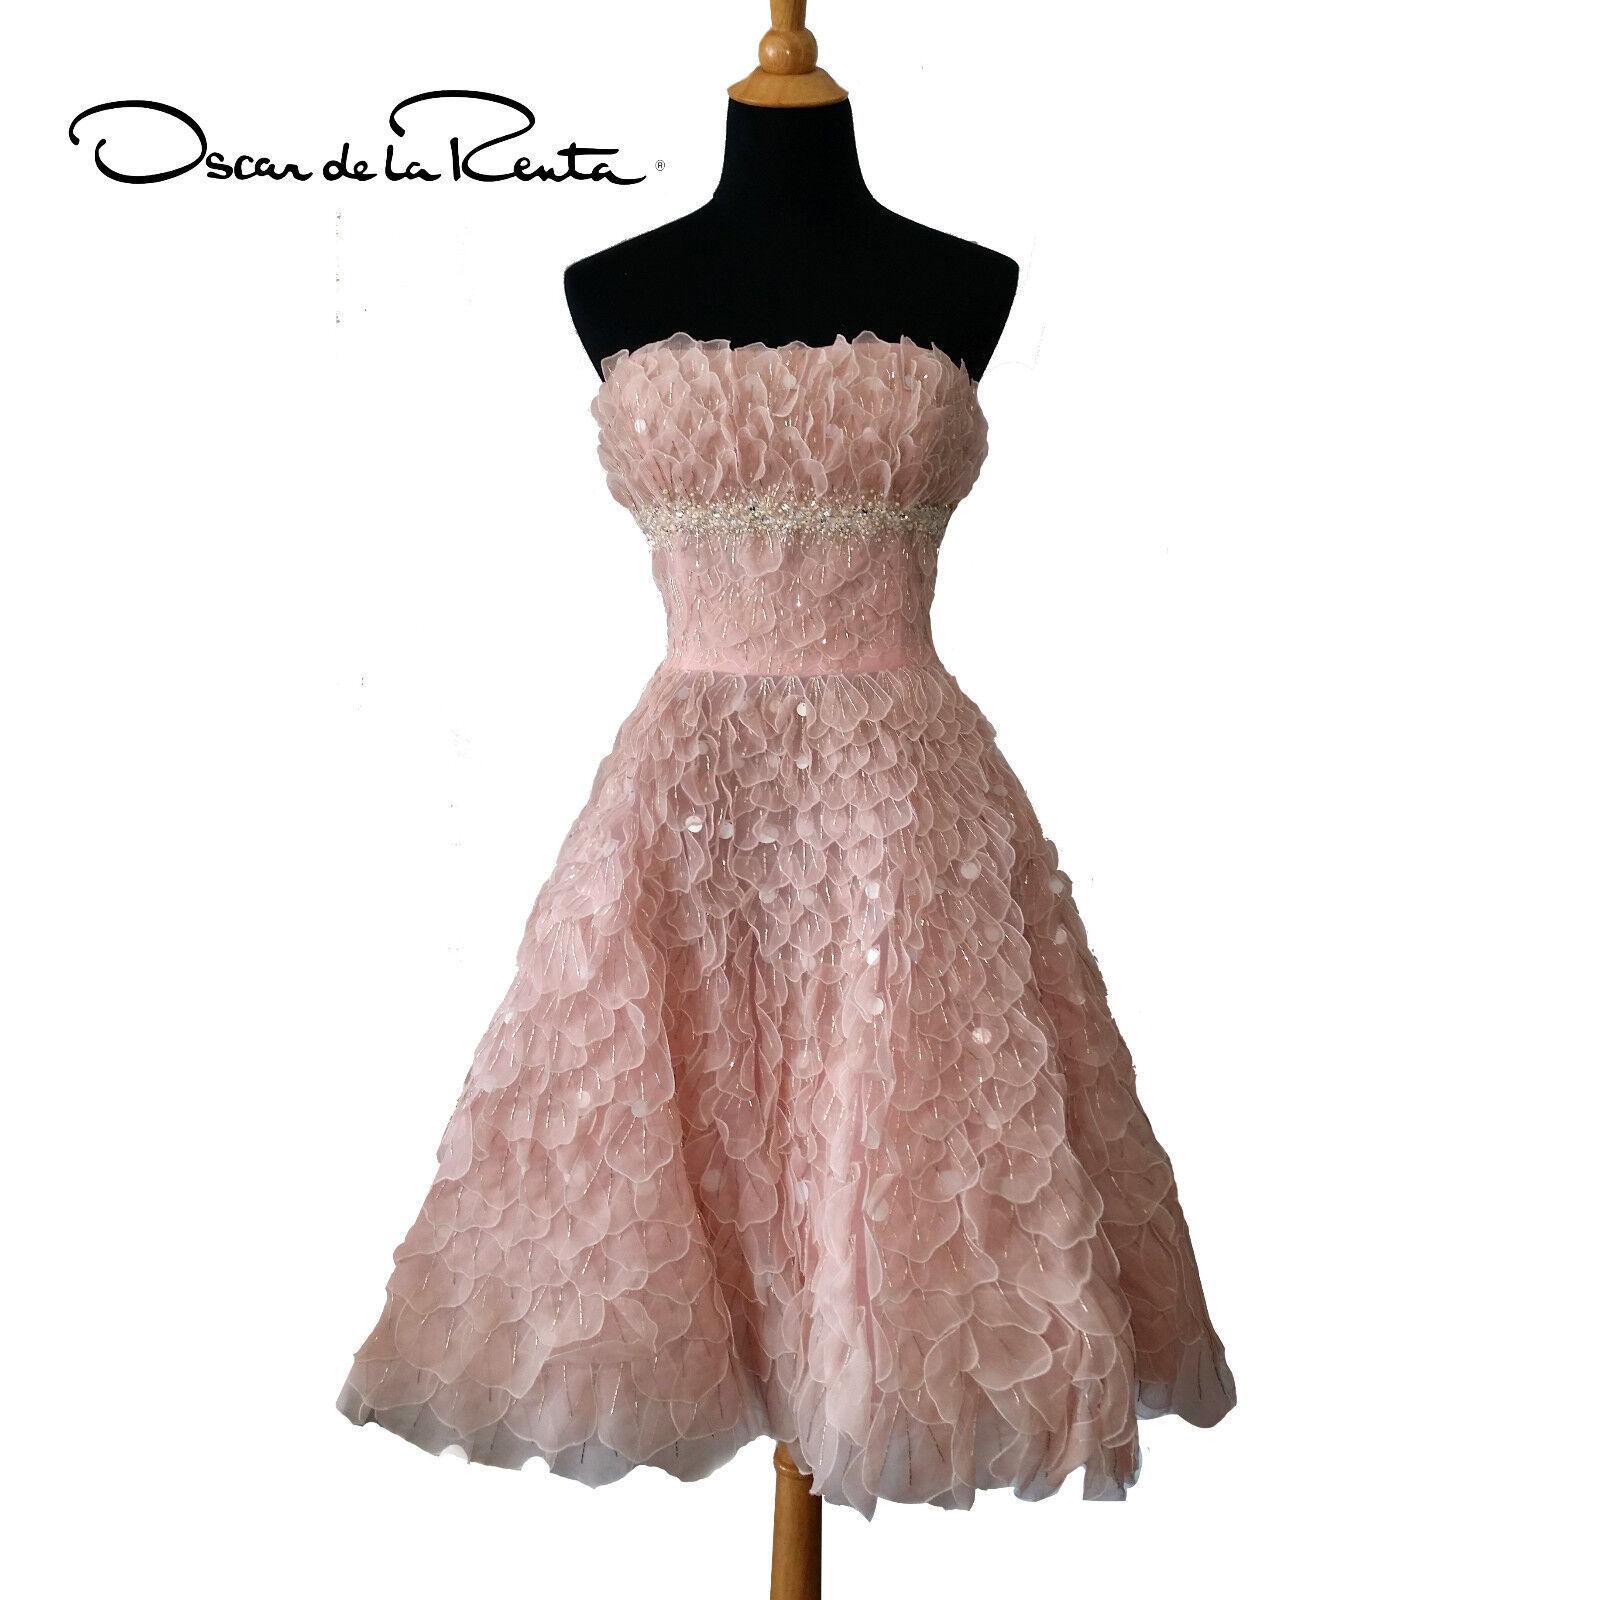 Embroidered Petal Gown Dress by Oscar De La Renta Sz 10   eBay